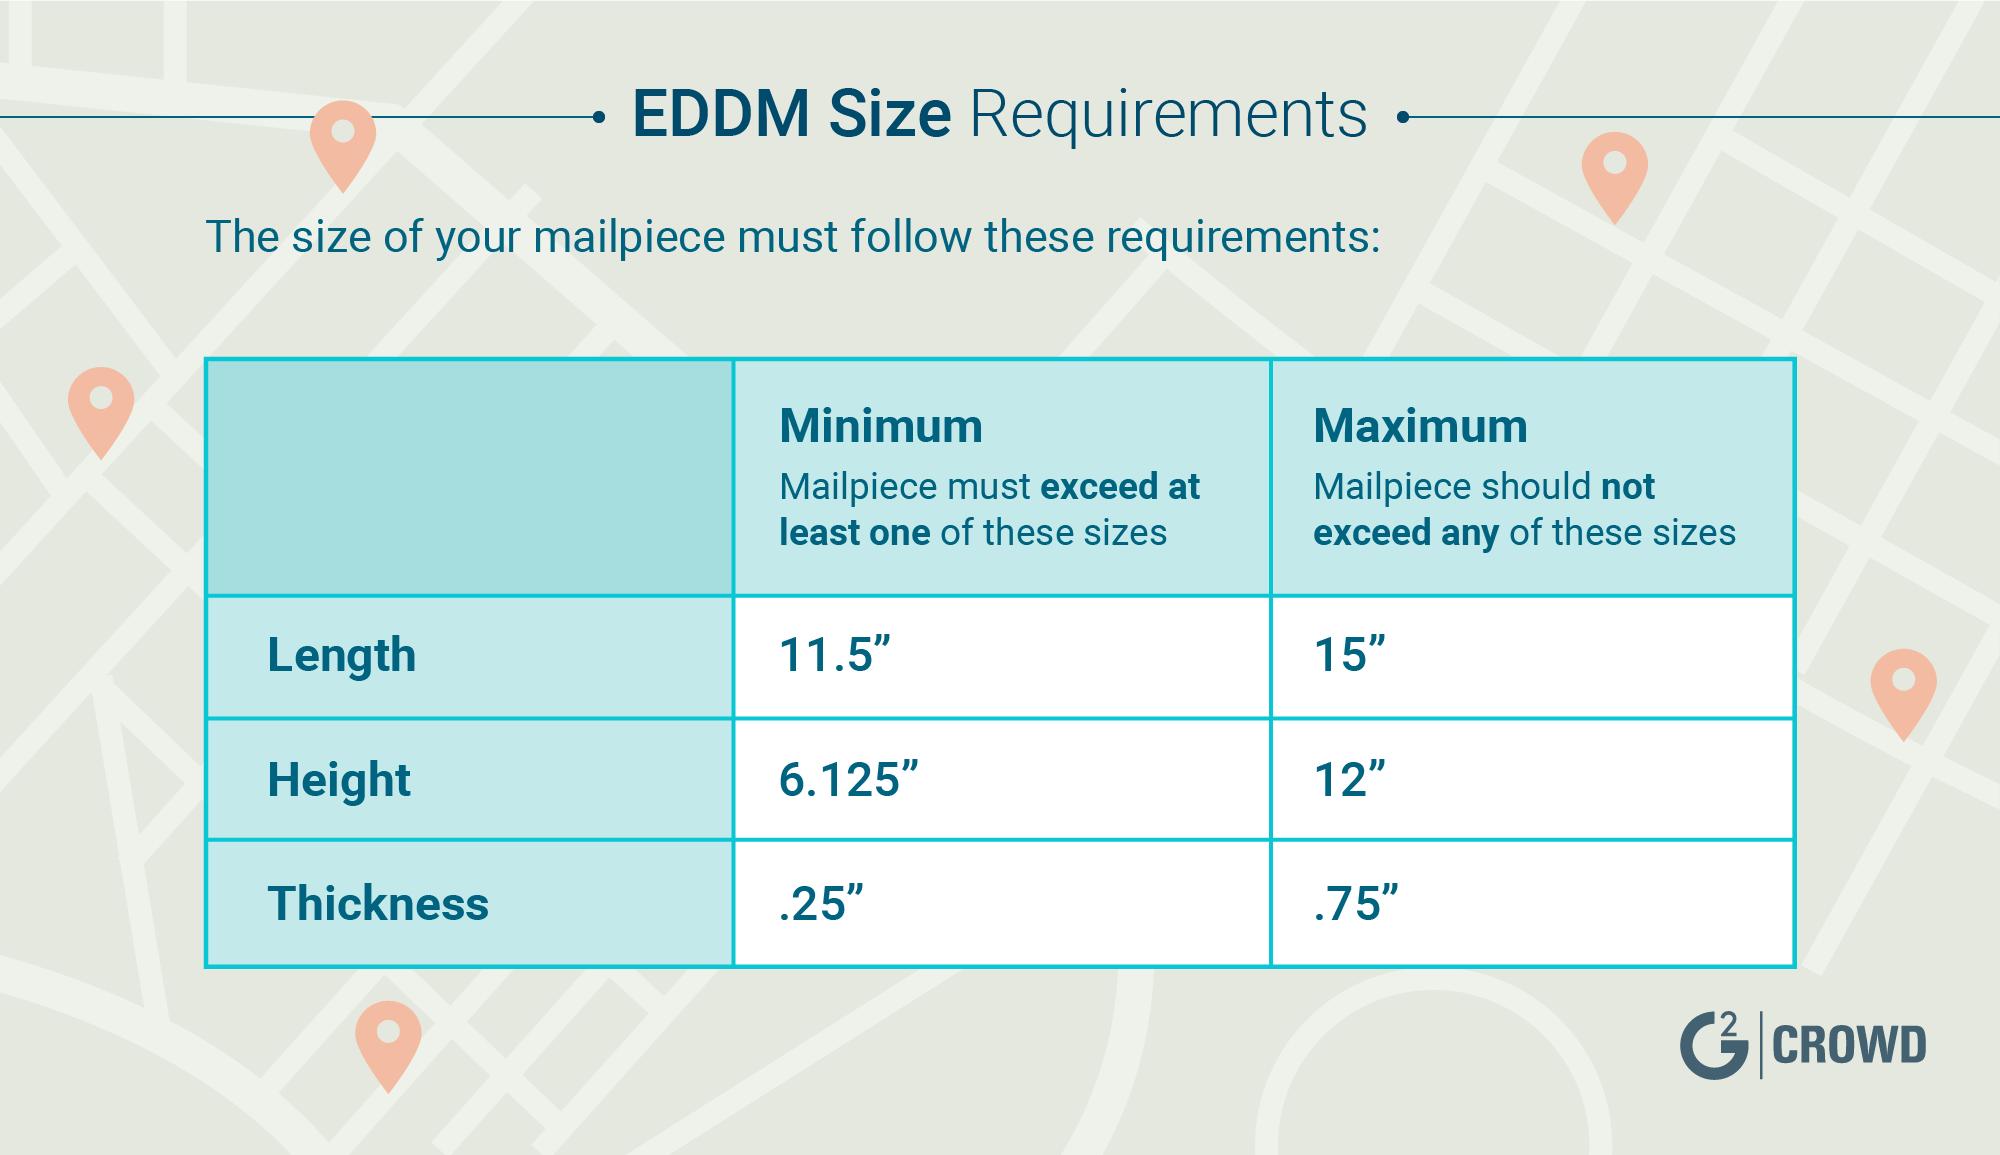 EDDM-sizes